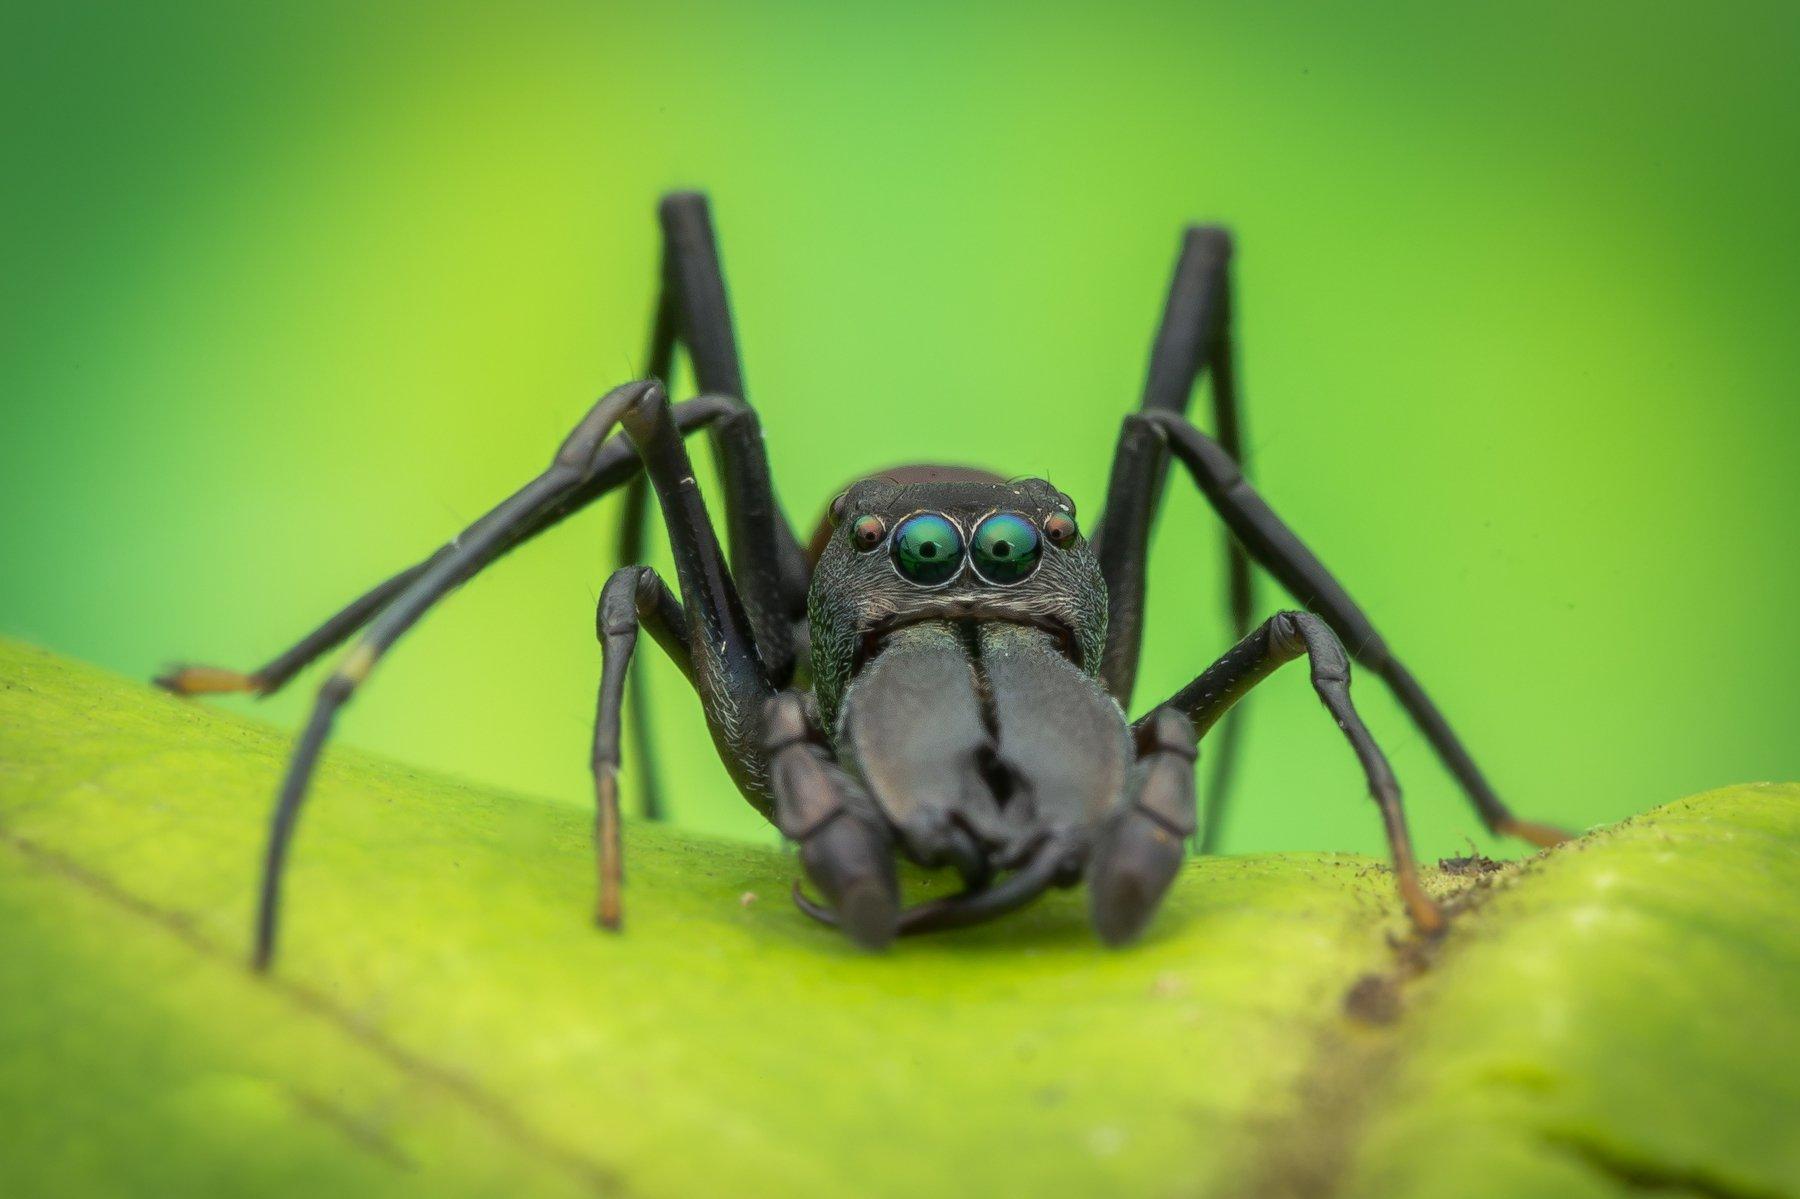 #hypnotize, #ant, #mimic, #spider, #eyes, #macro, #npl, Nik Peter Liew